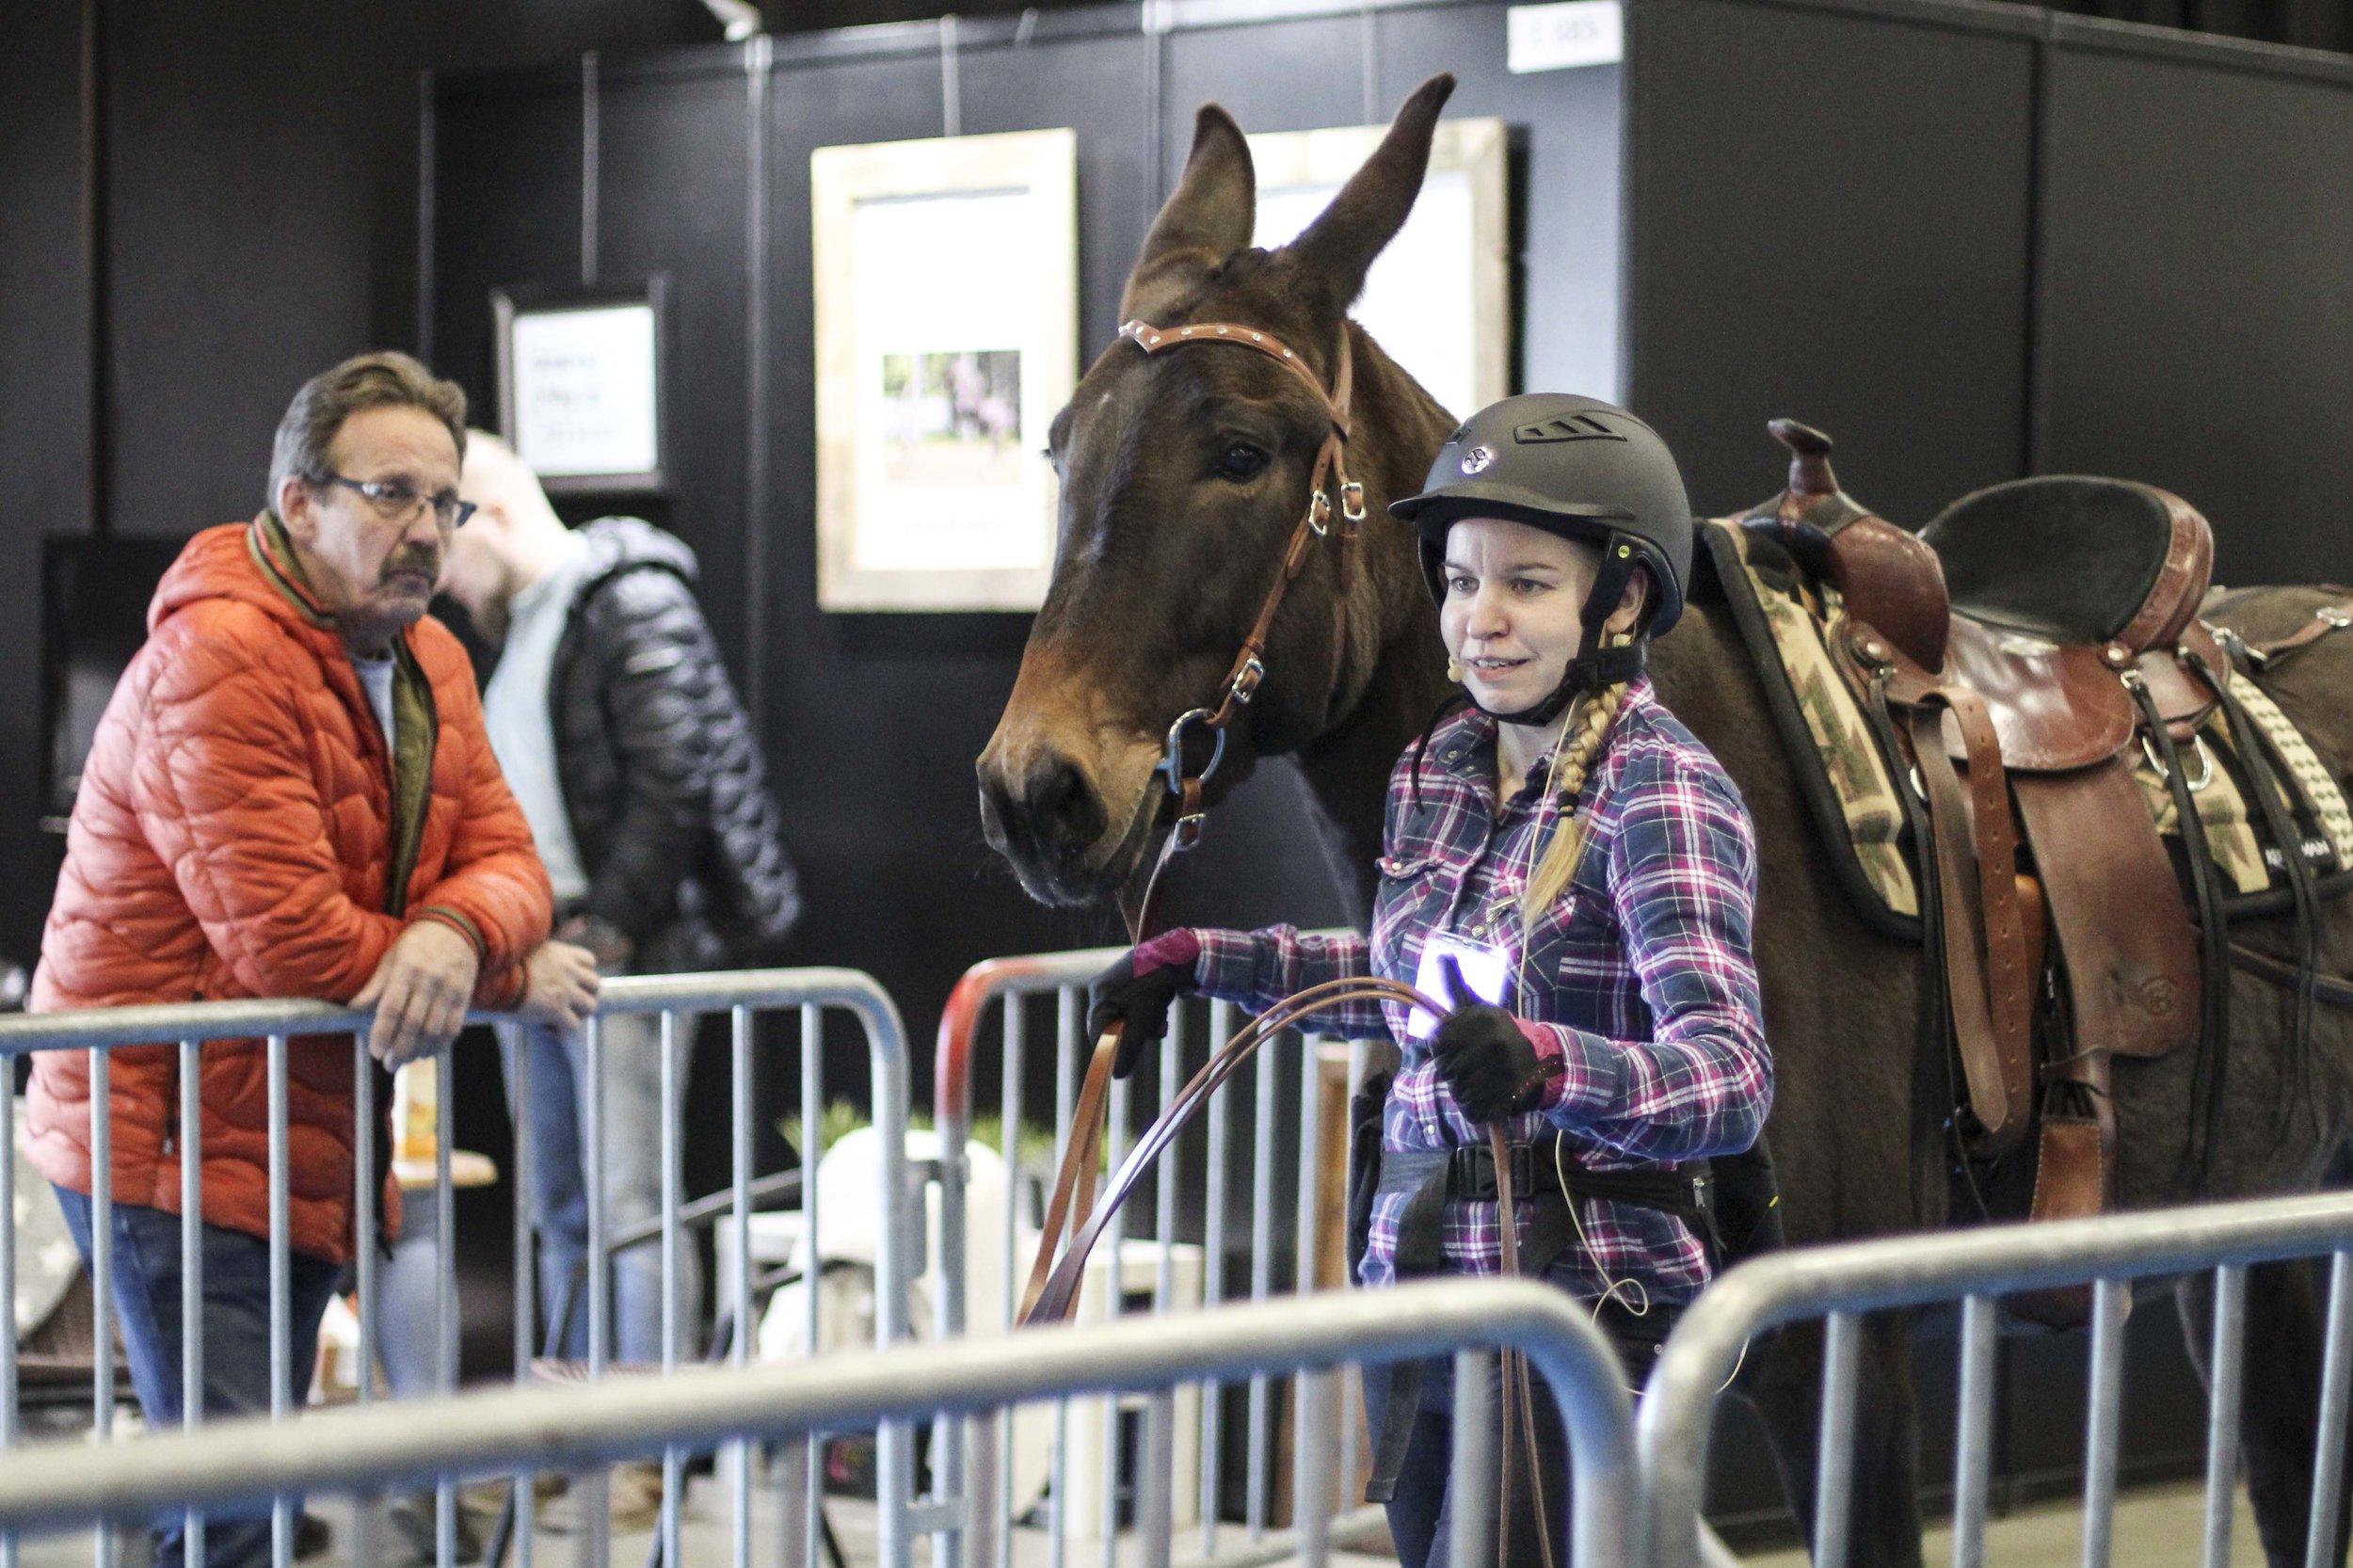 Kaisa & Muuli at the Horse Fair. Photo by Veera Kopakkala